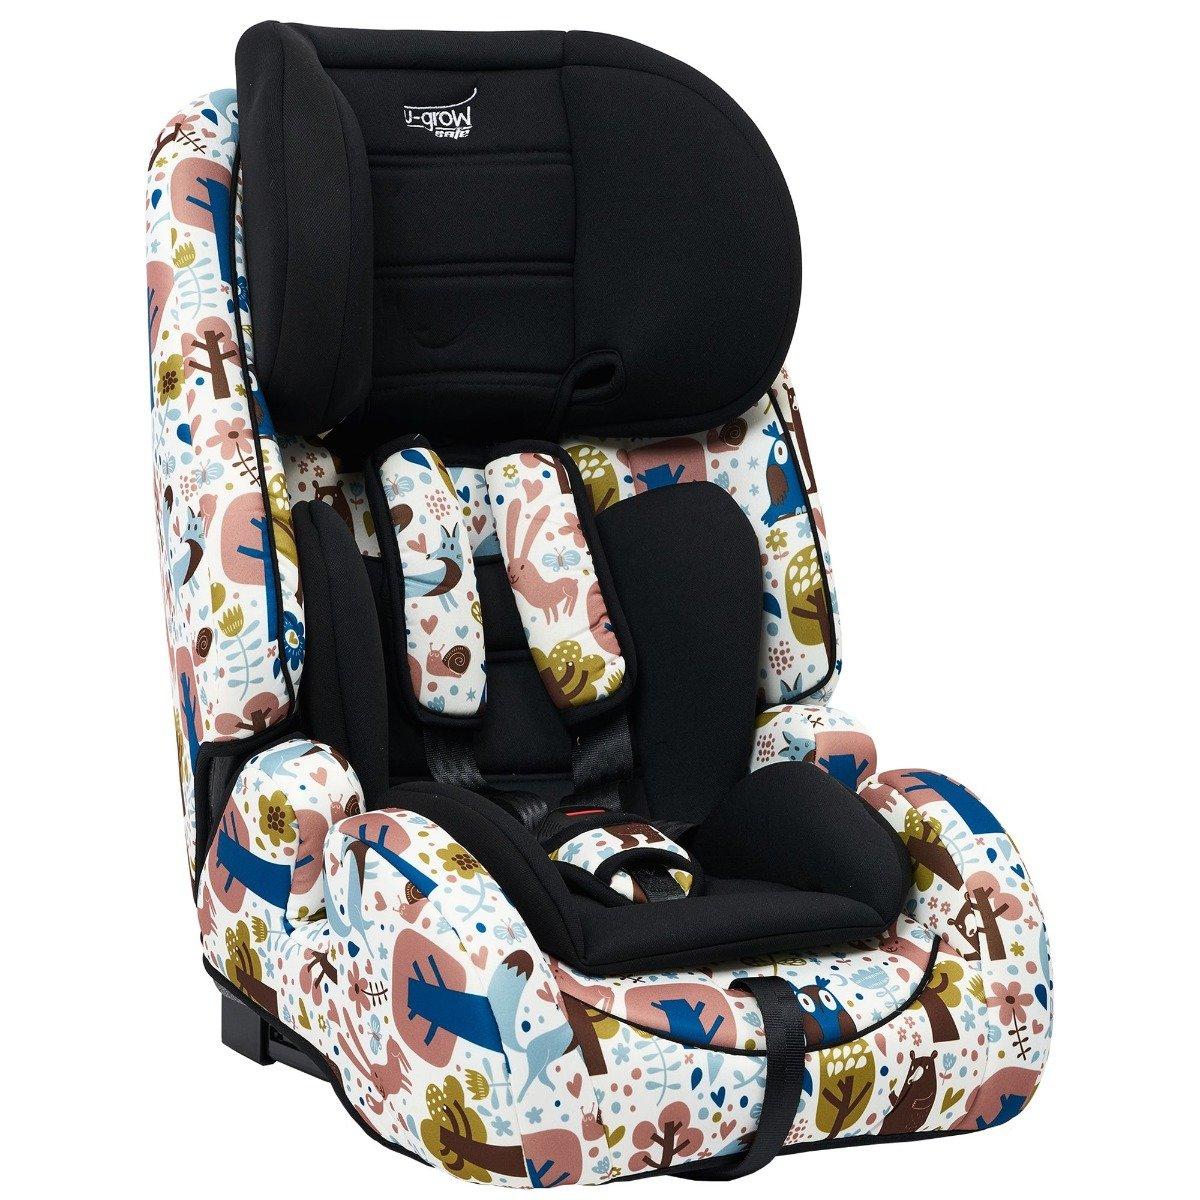 Scaun auto copii U-Grow U708-FRS imagine